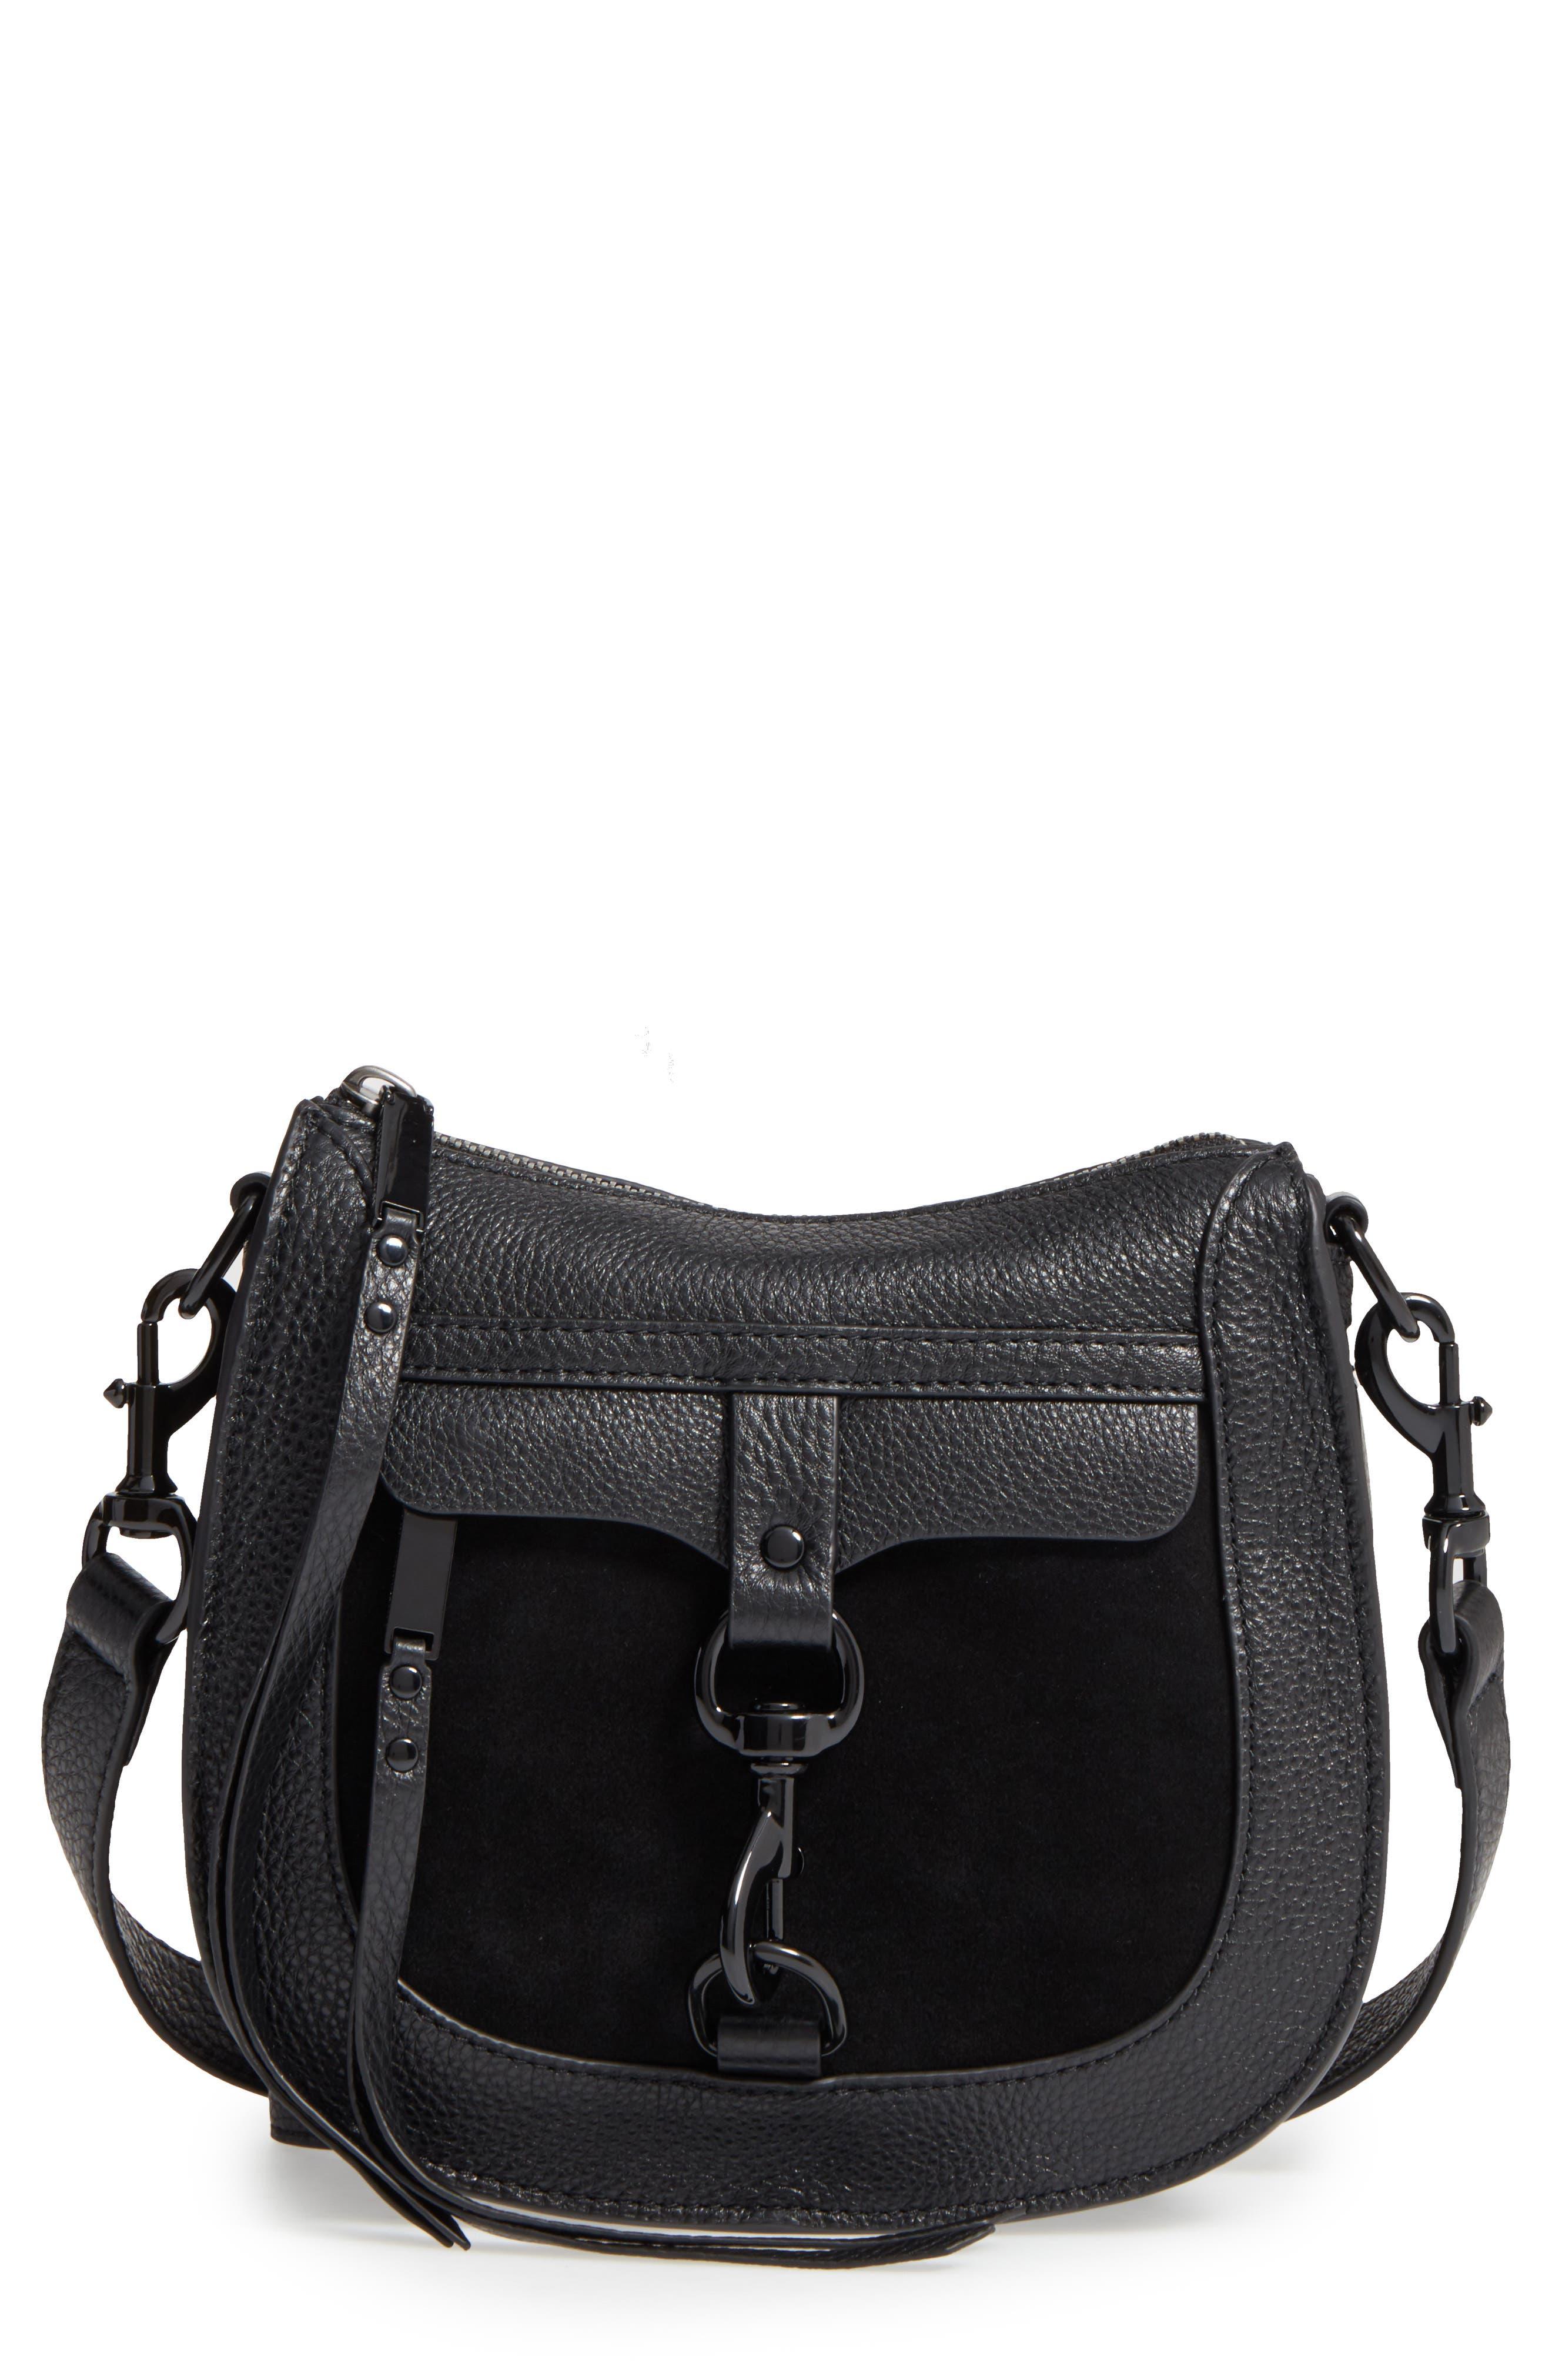 Alternate Image 1 Selected - Rebecca Minkoff Dog Clip Leather & Suede Saddle Bag (Nordstrom Exclusive)